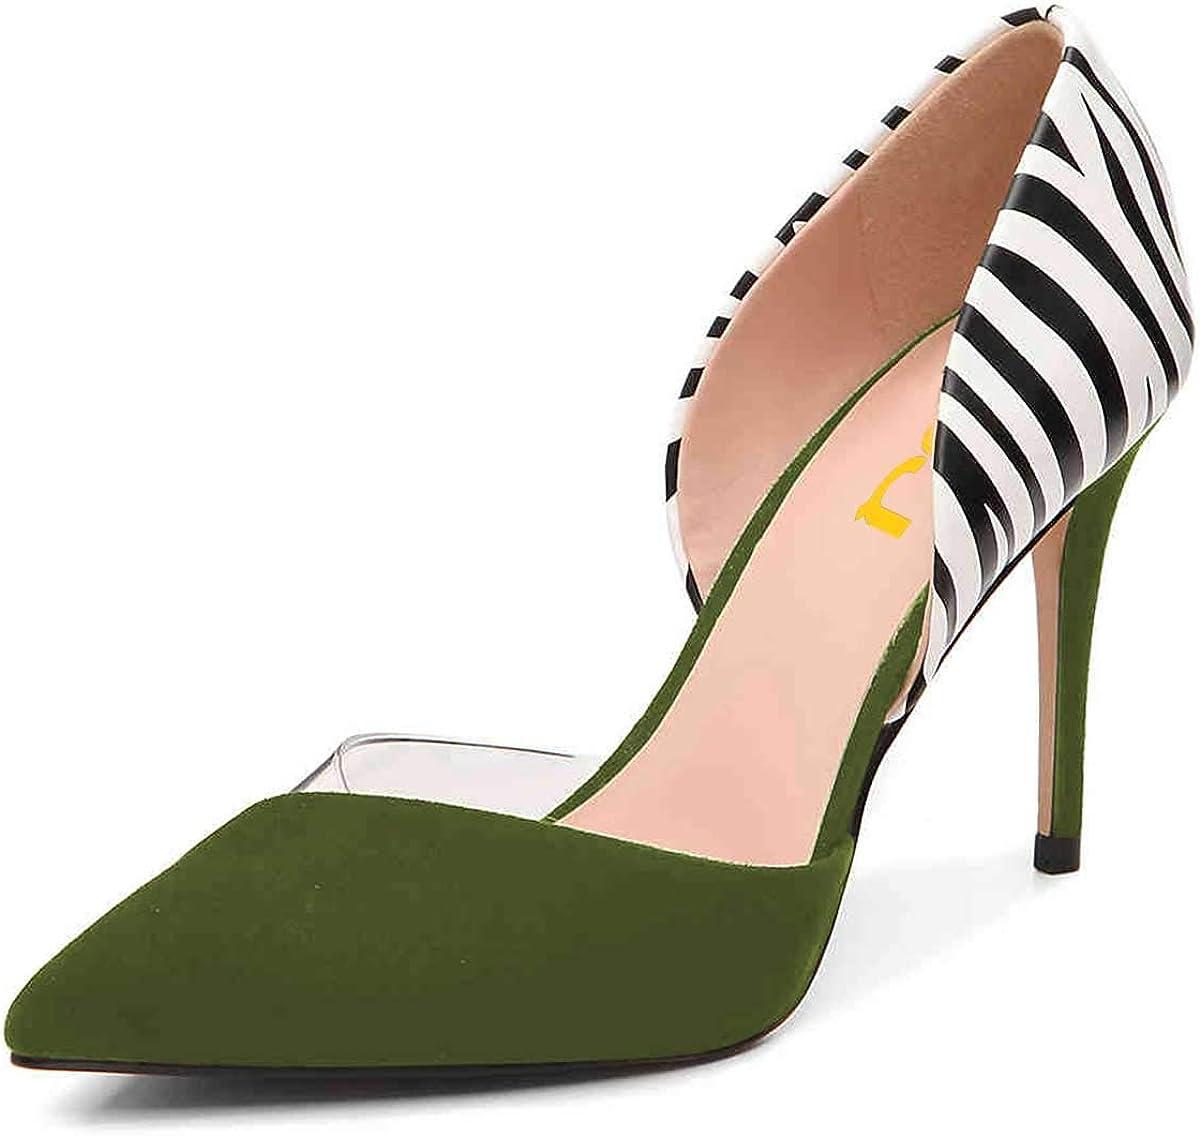 FSJ Women Formal Stiletto High Heel Pumps Pointy Toe D'Orsay Sandals Slip on Office Lady Dress Party Shoes Size 4-15 US